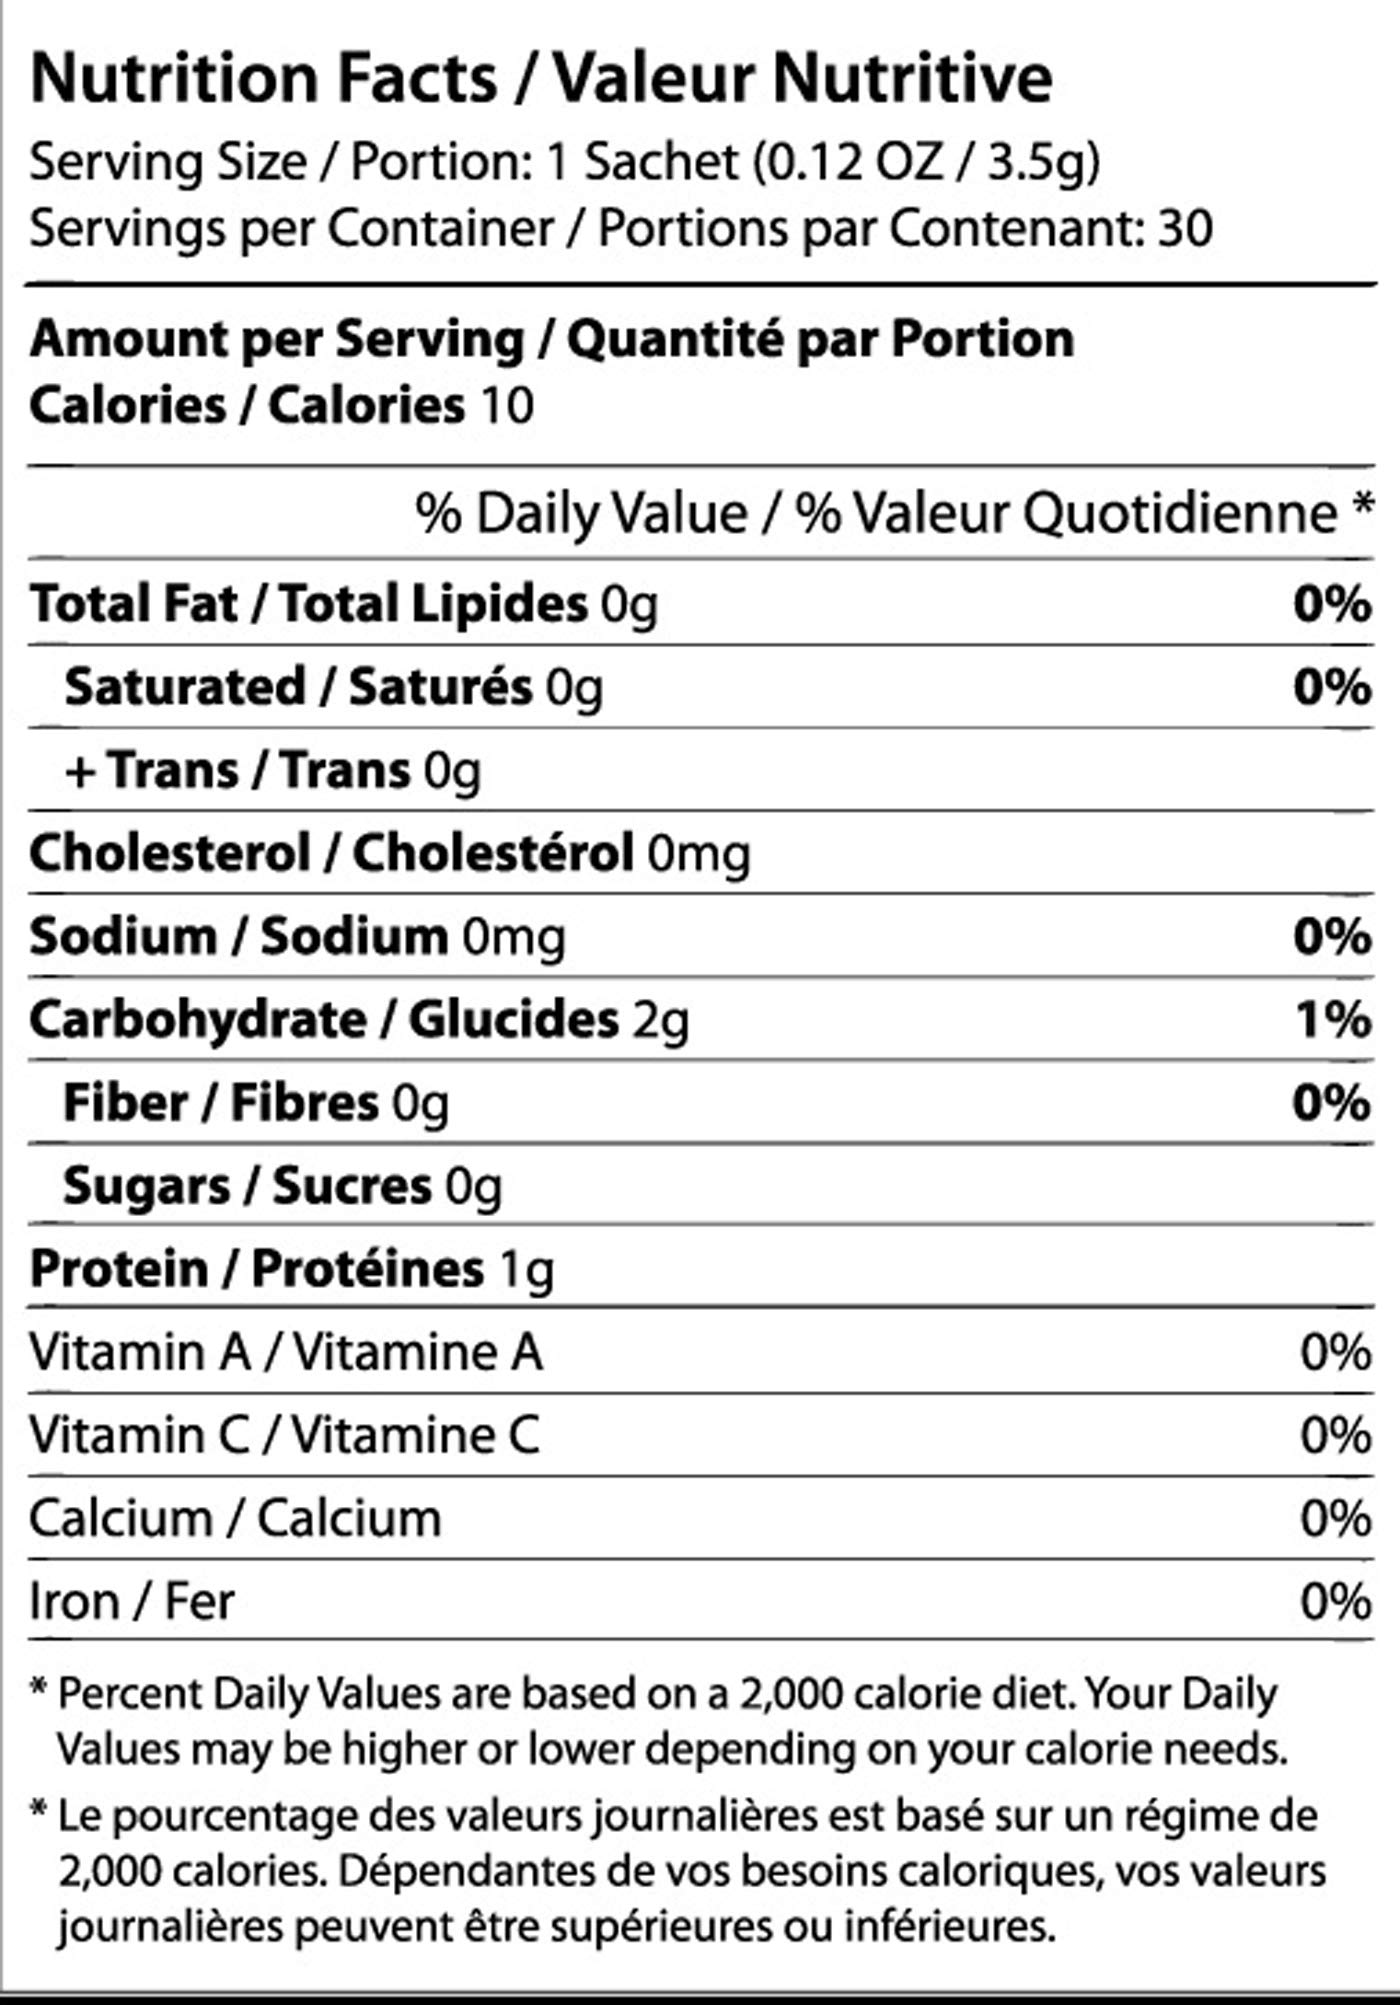 Organo Gold Gourmet Premium Black Coffee Made With Antioxidant Rich Organic Ganoderma Lucidum U.S.A. Packaging (2 Boxes)